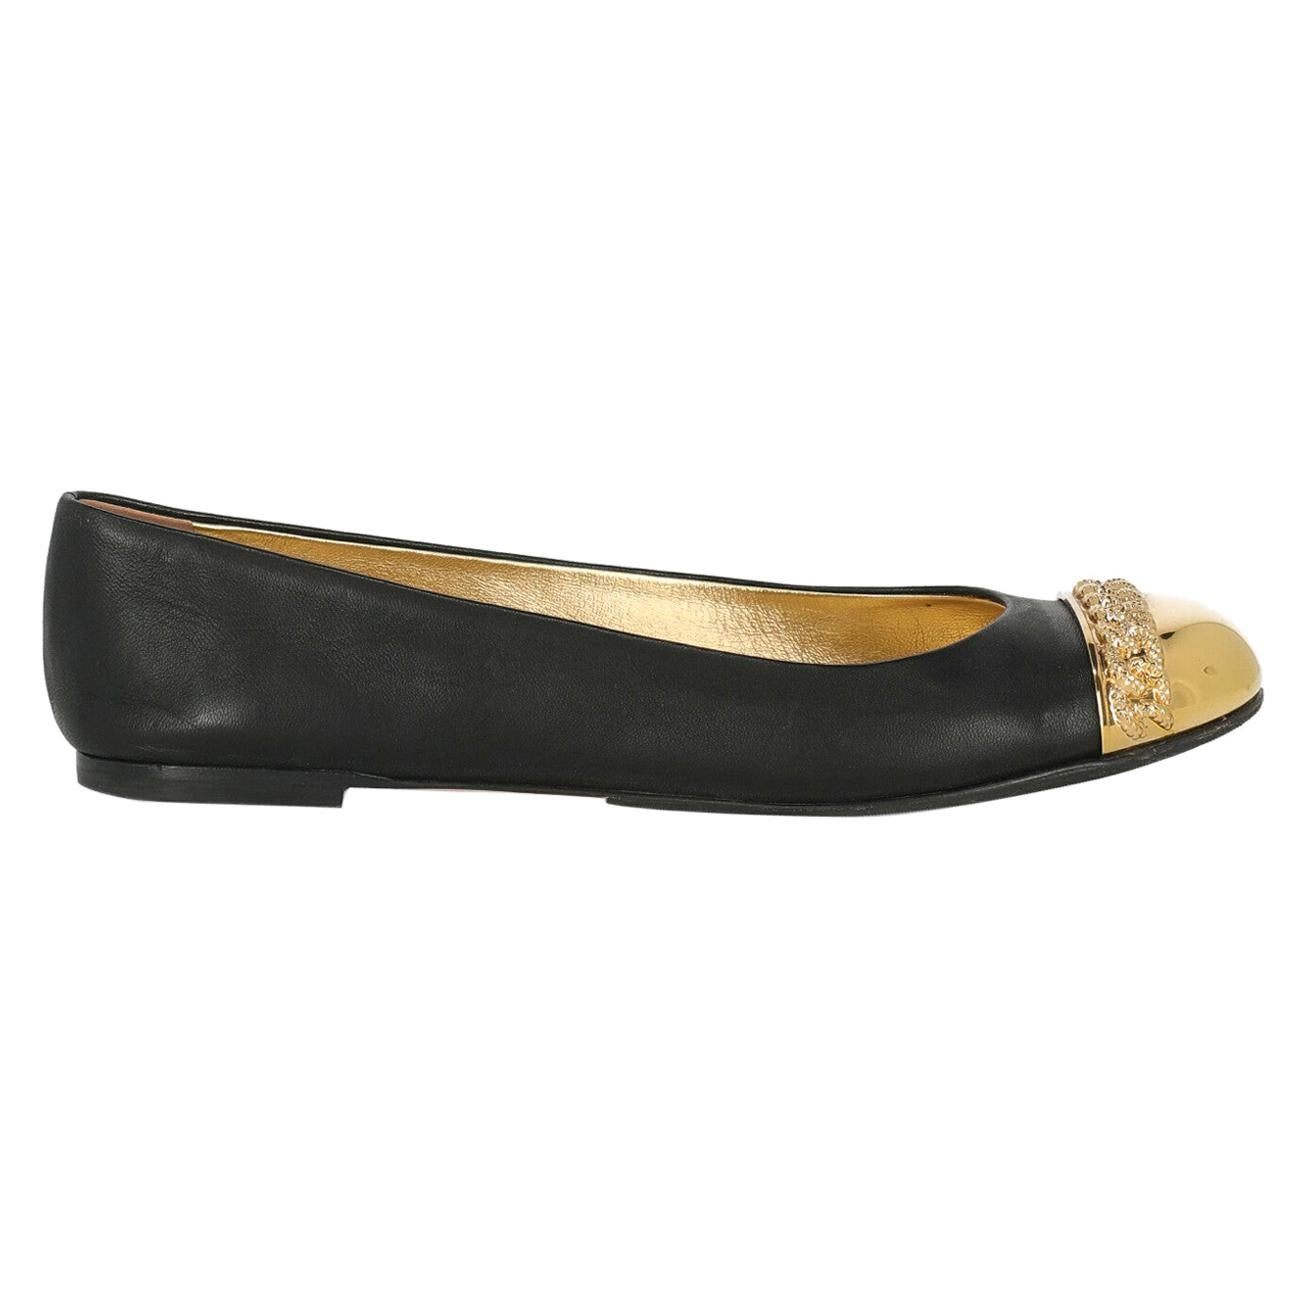 Casadei Woman Ballet flats Black Leather IT 37.5